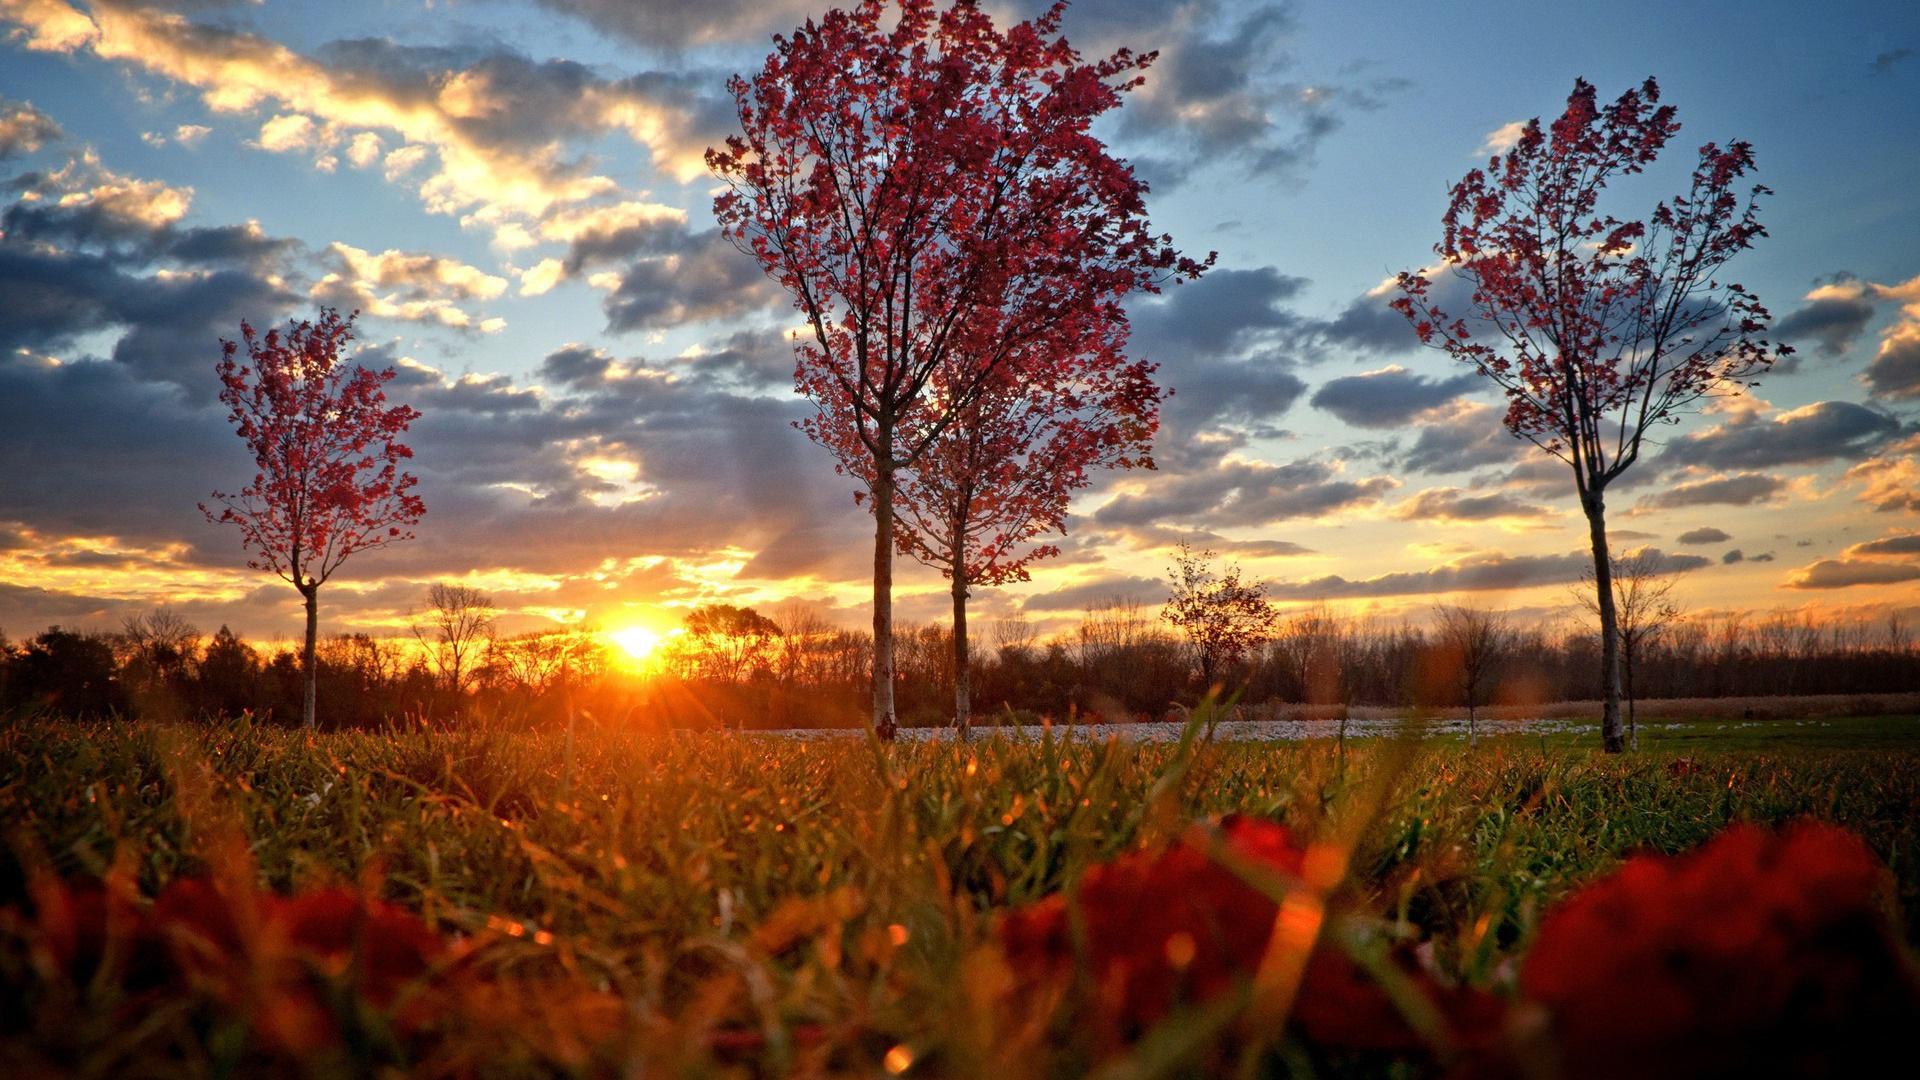 High Resolution Fall Wallpaper: Autumn Wallpapers High Quality